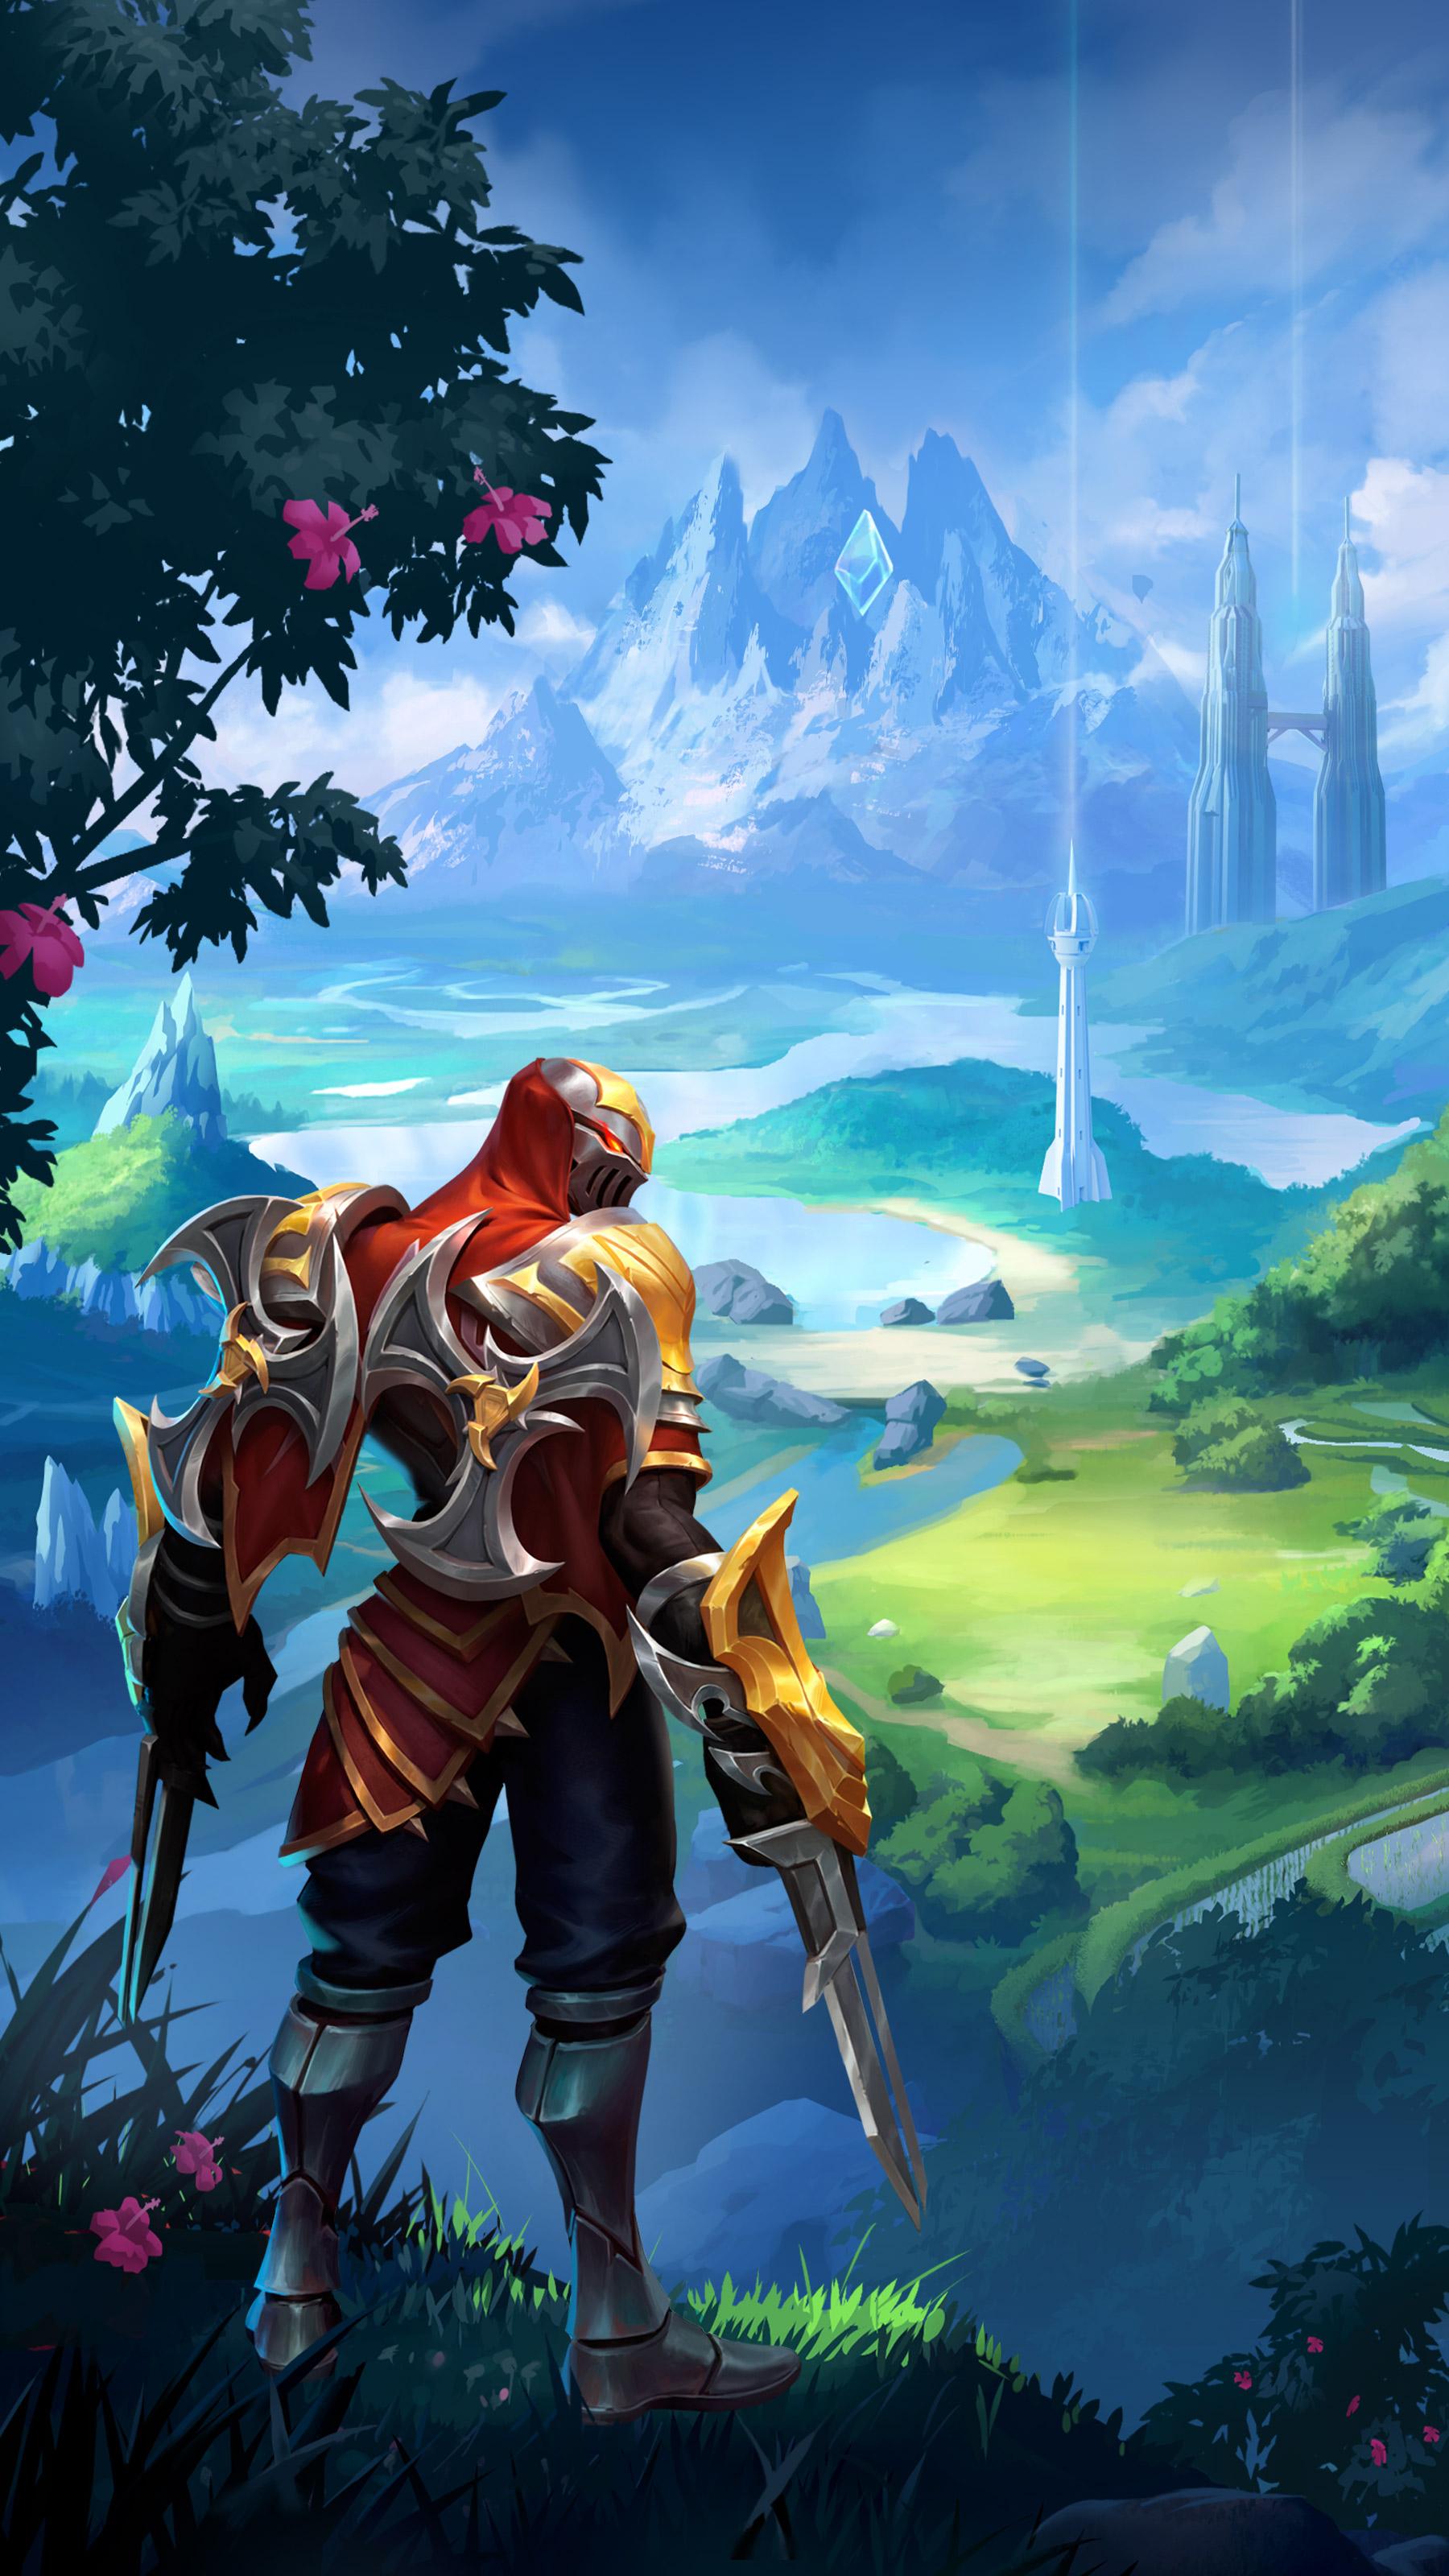 15+ Wallpaper League of Legends: Wild Rift Untuk PC dan Hp 1